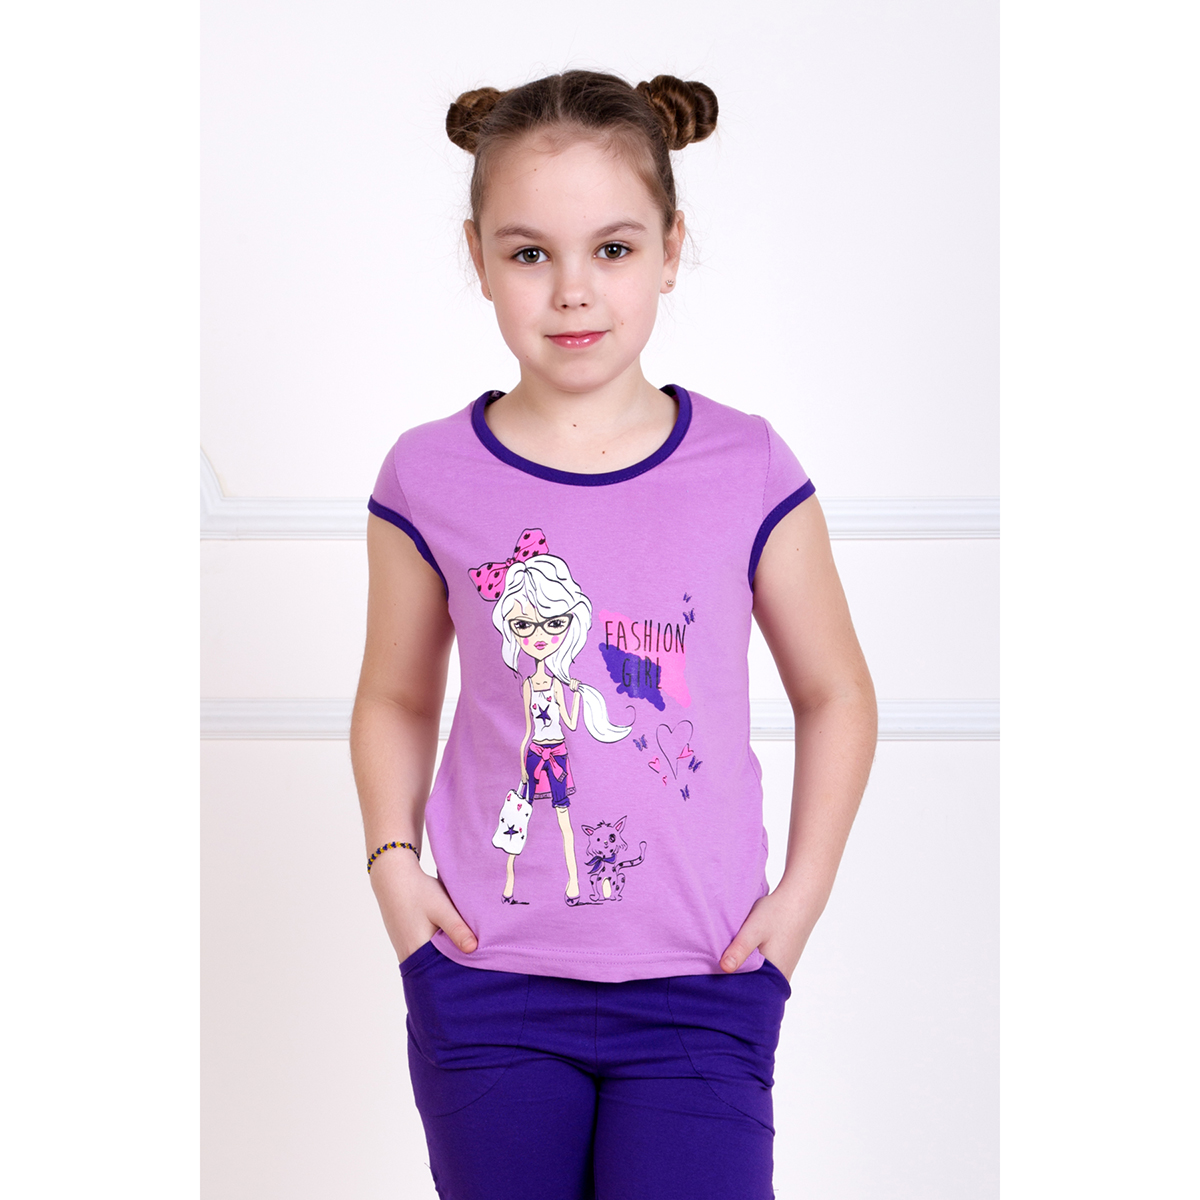 Детский костюм Катюша, размер 4 годаКостюмы<br><br><br>Тип: Дет. костюм<br>Размер: 4 года<br>Материал: Кулирка